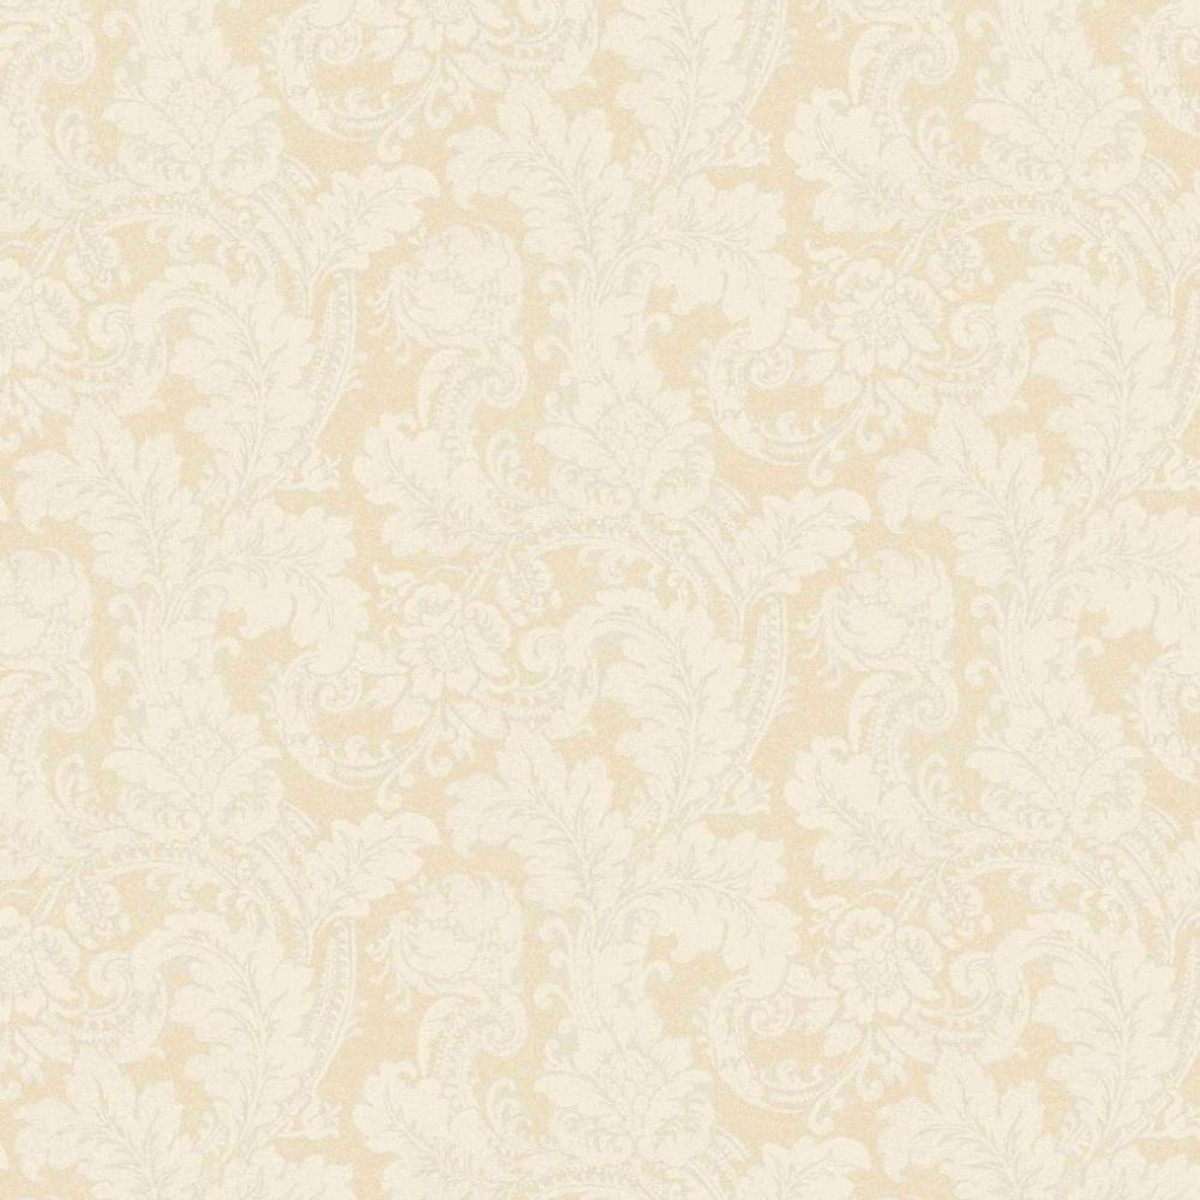 Обои флизелиновые Wallberry Бренда бежевые 1.06 м 142003